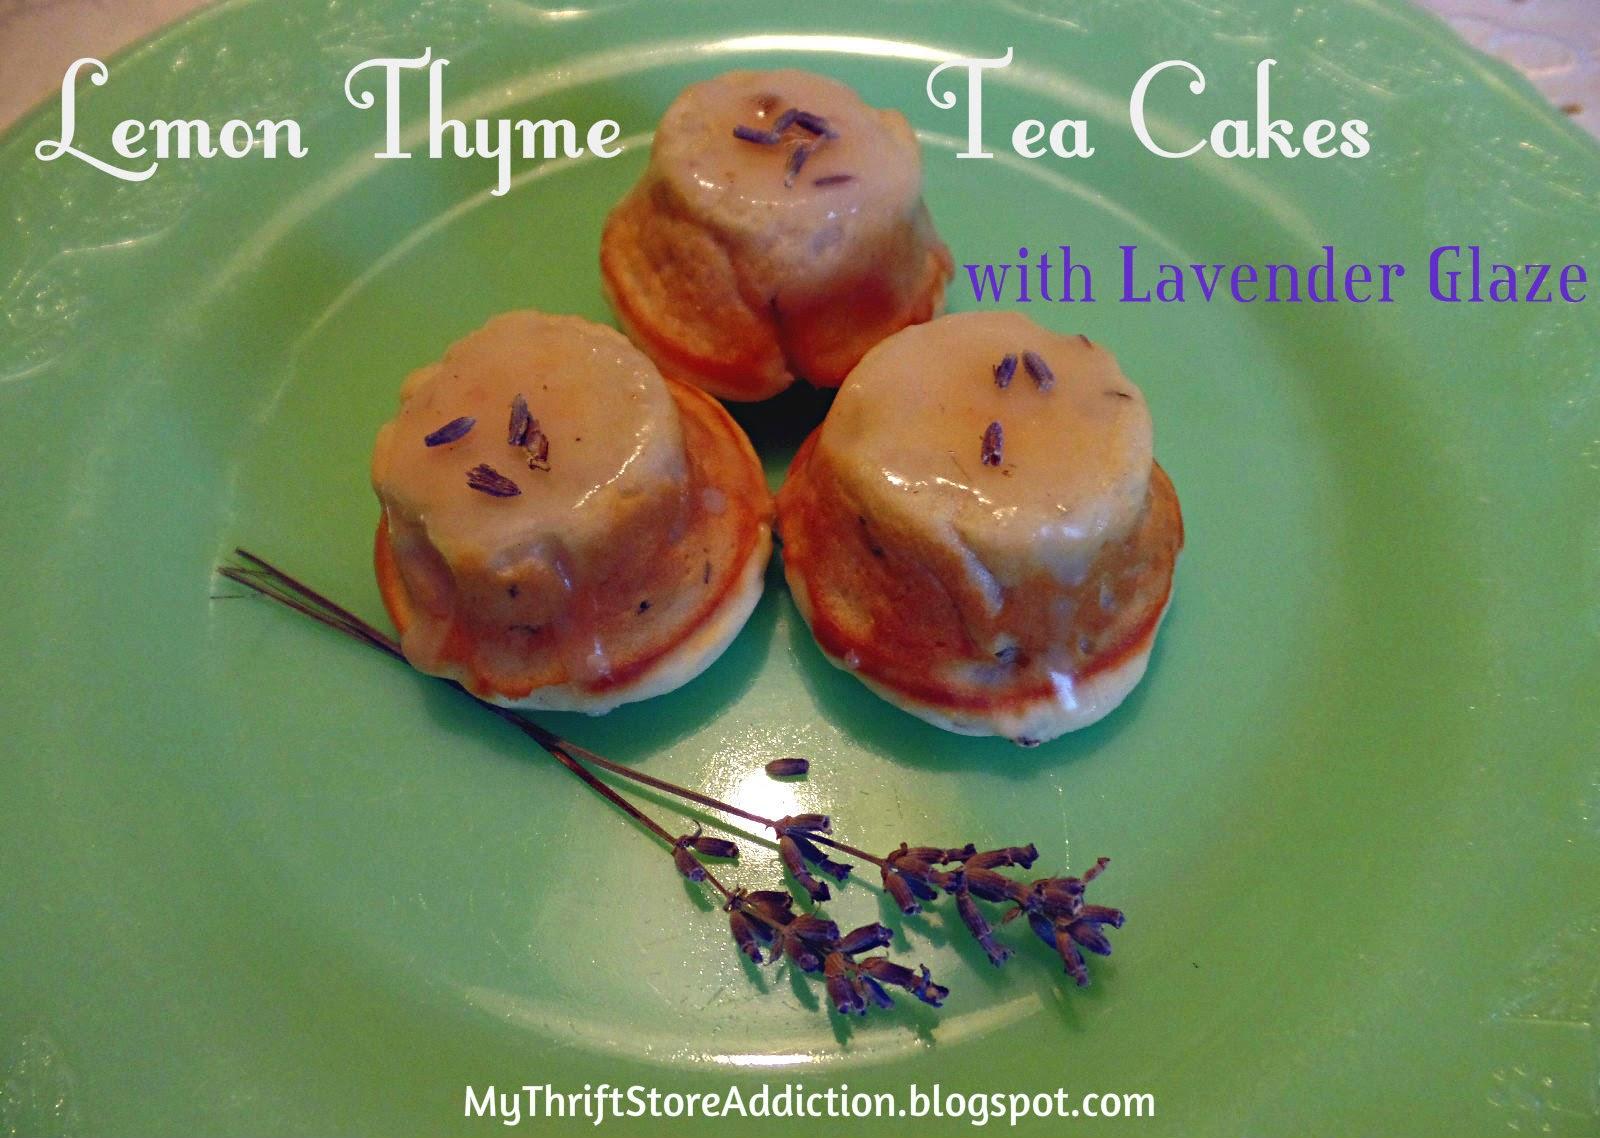 Lemon thyme tea cups